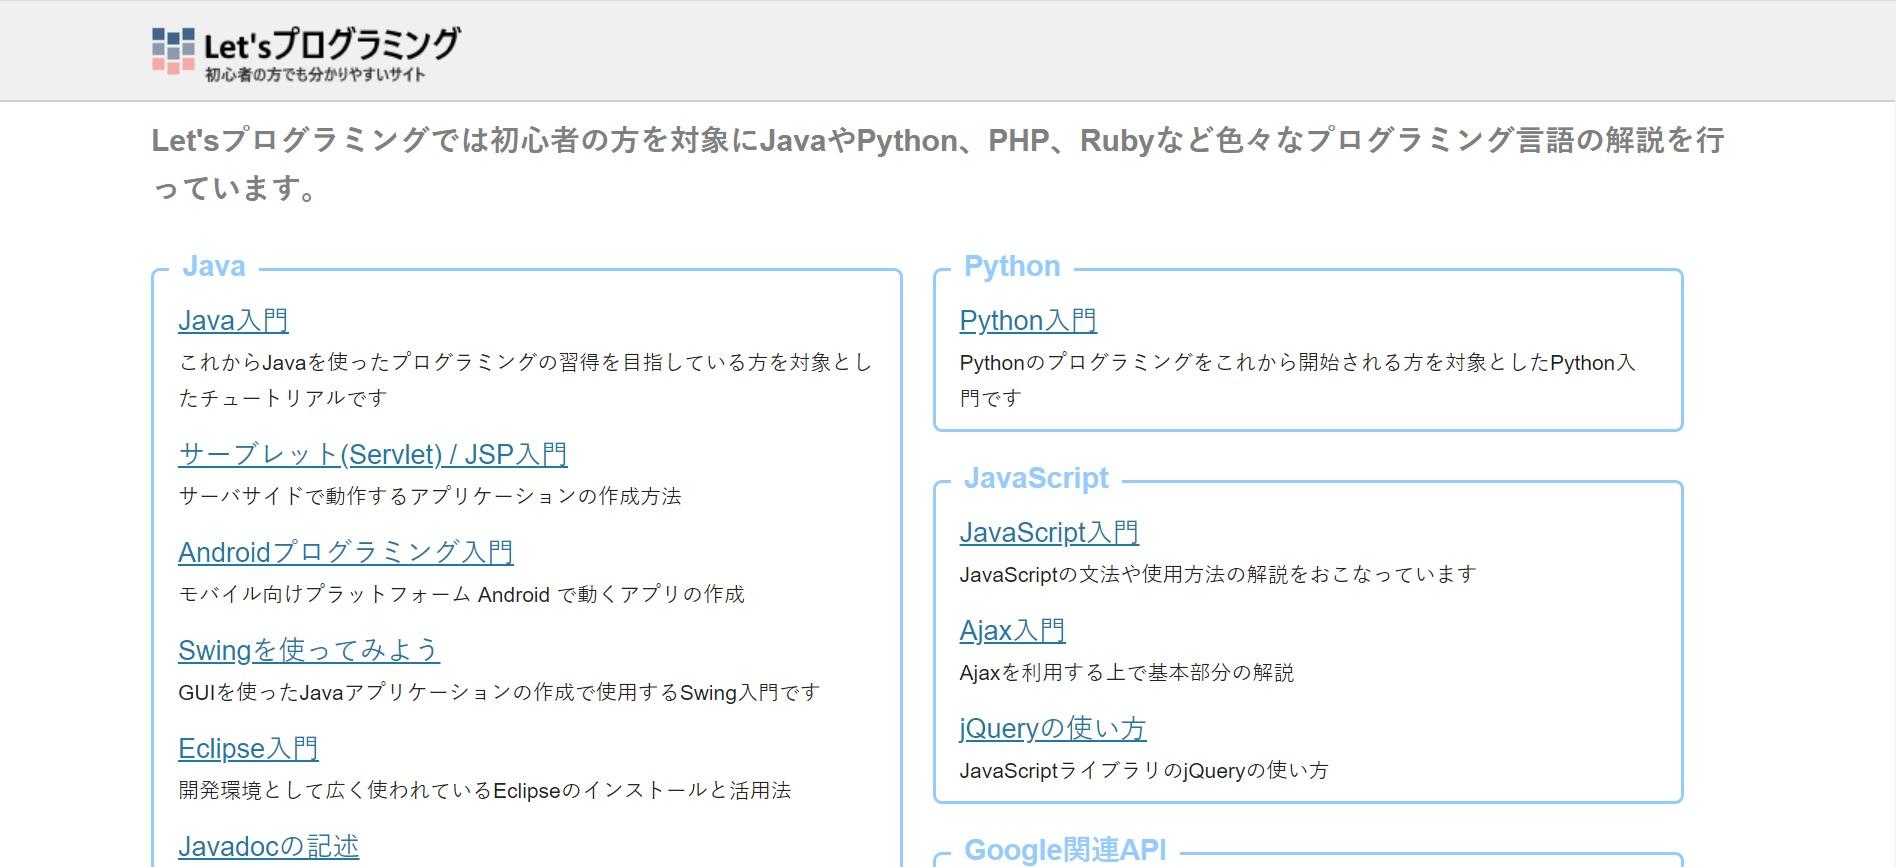 lett'sプログラミング公式ページ画像